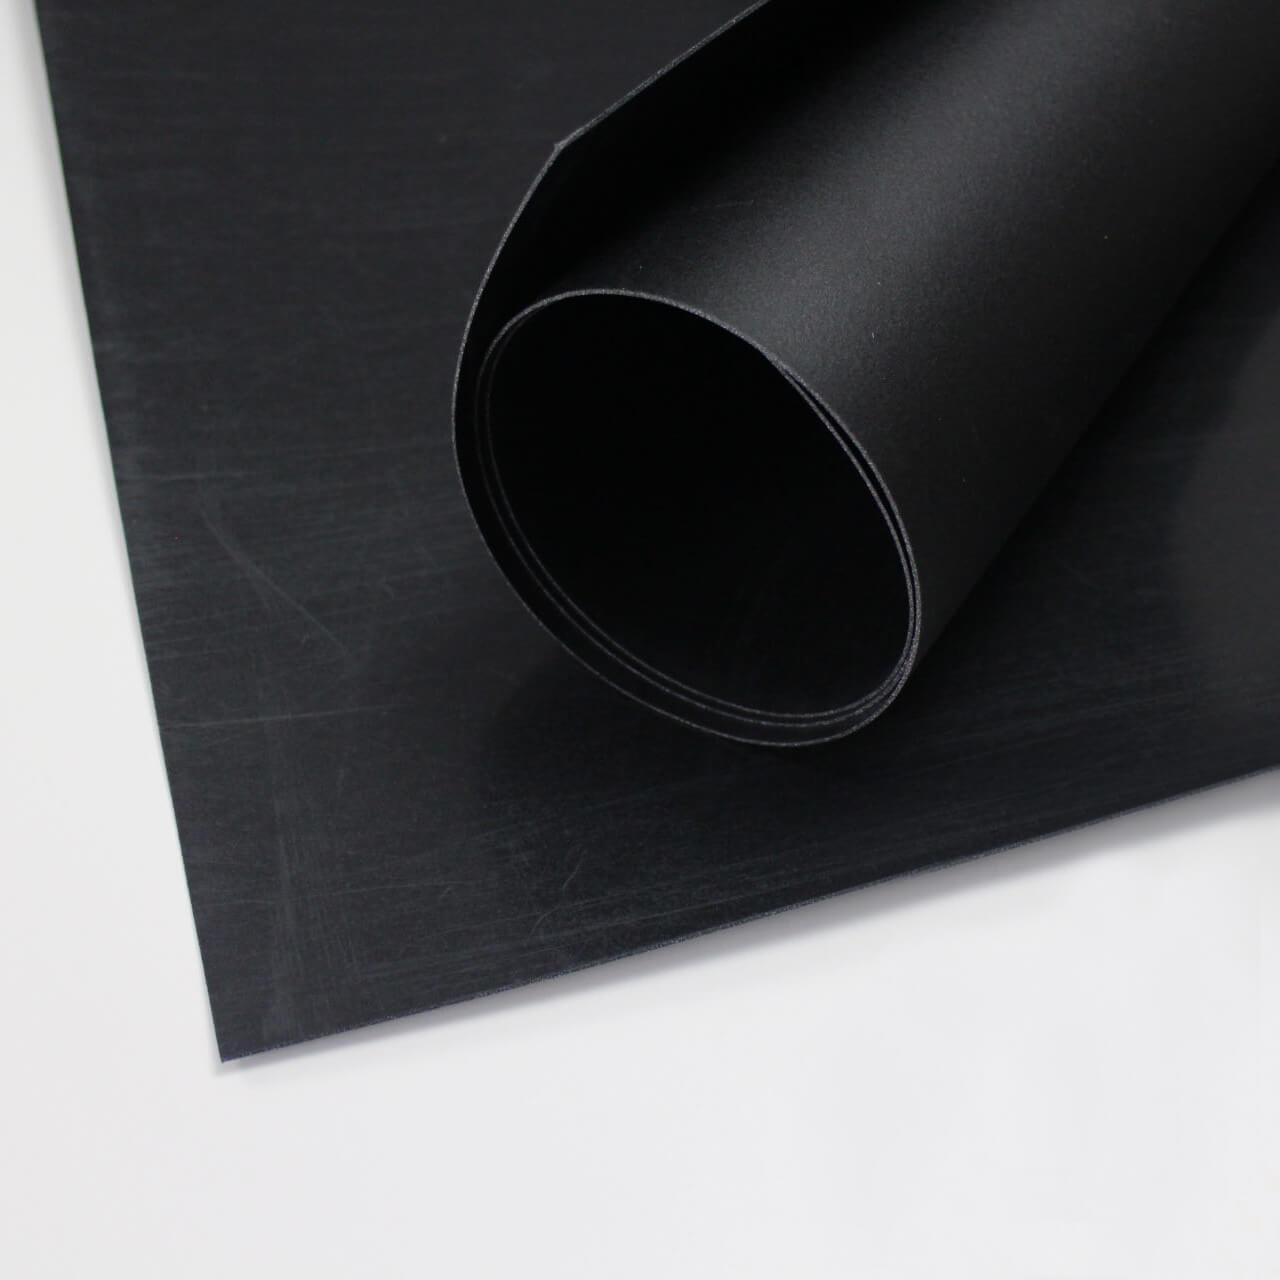 Worbla black art product image